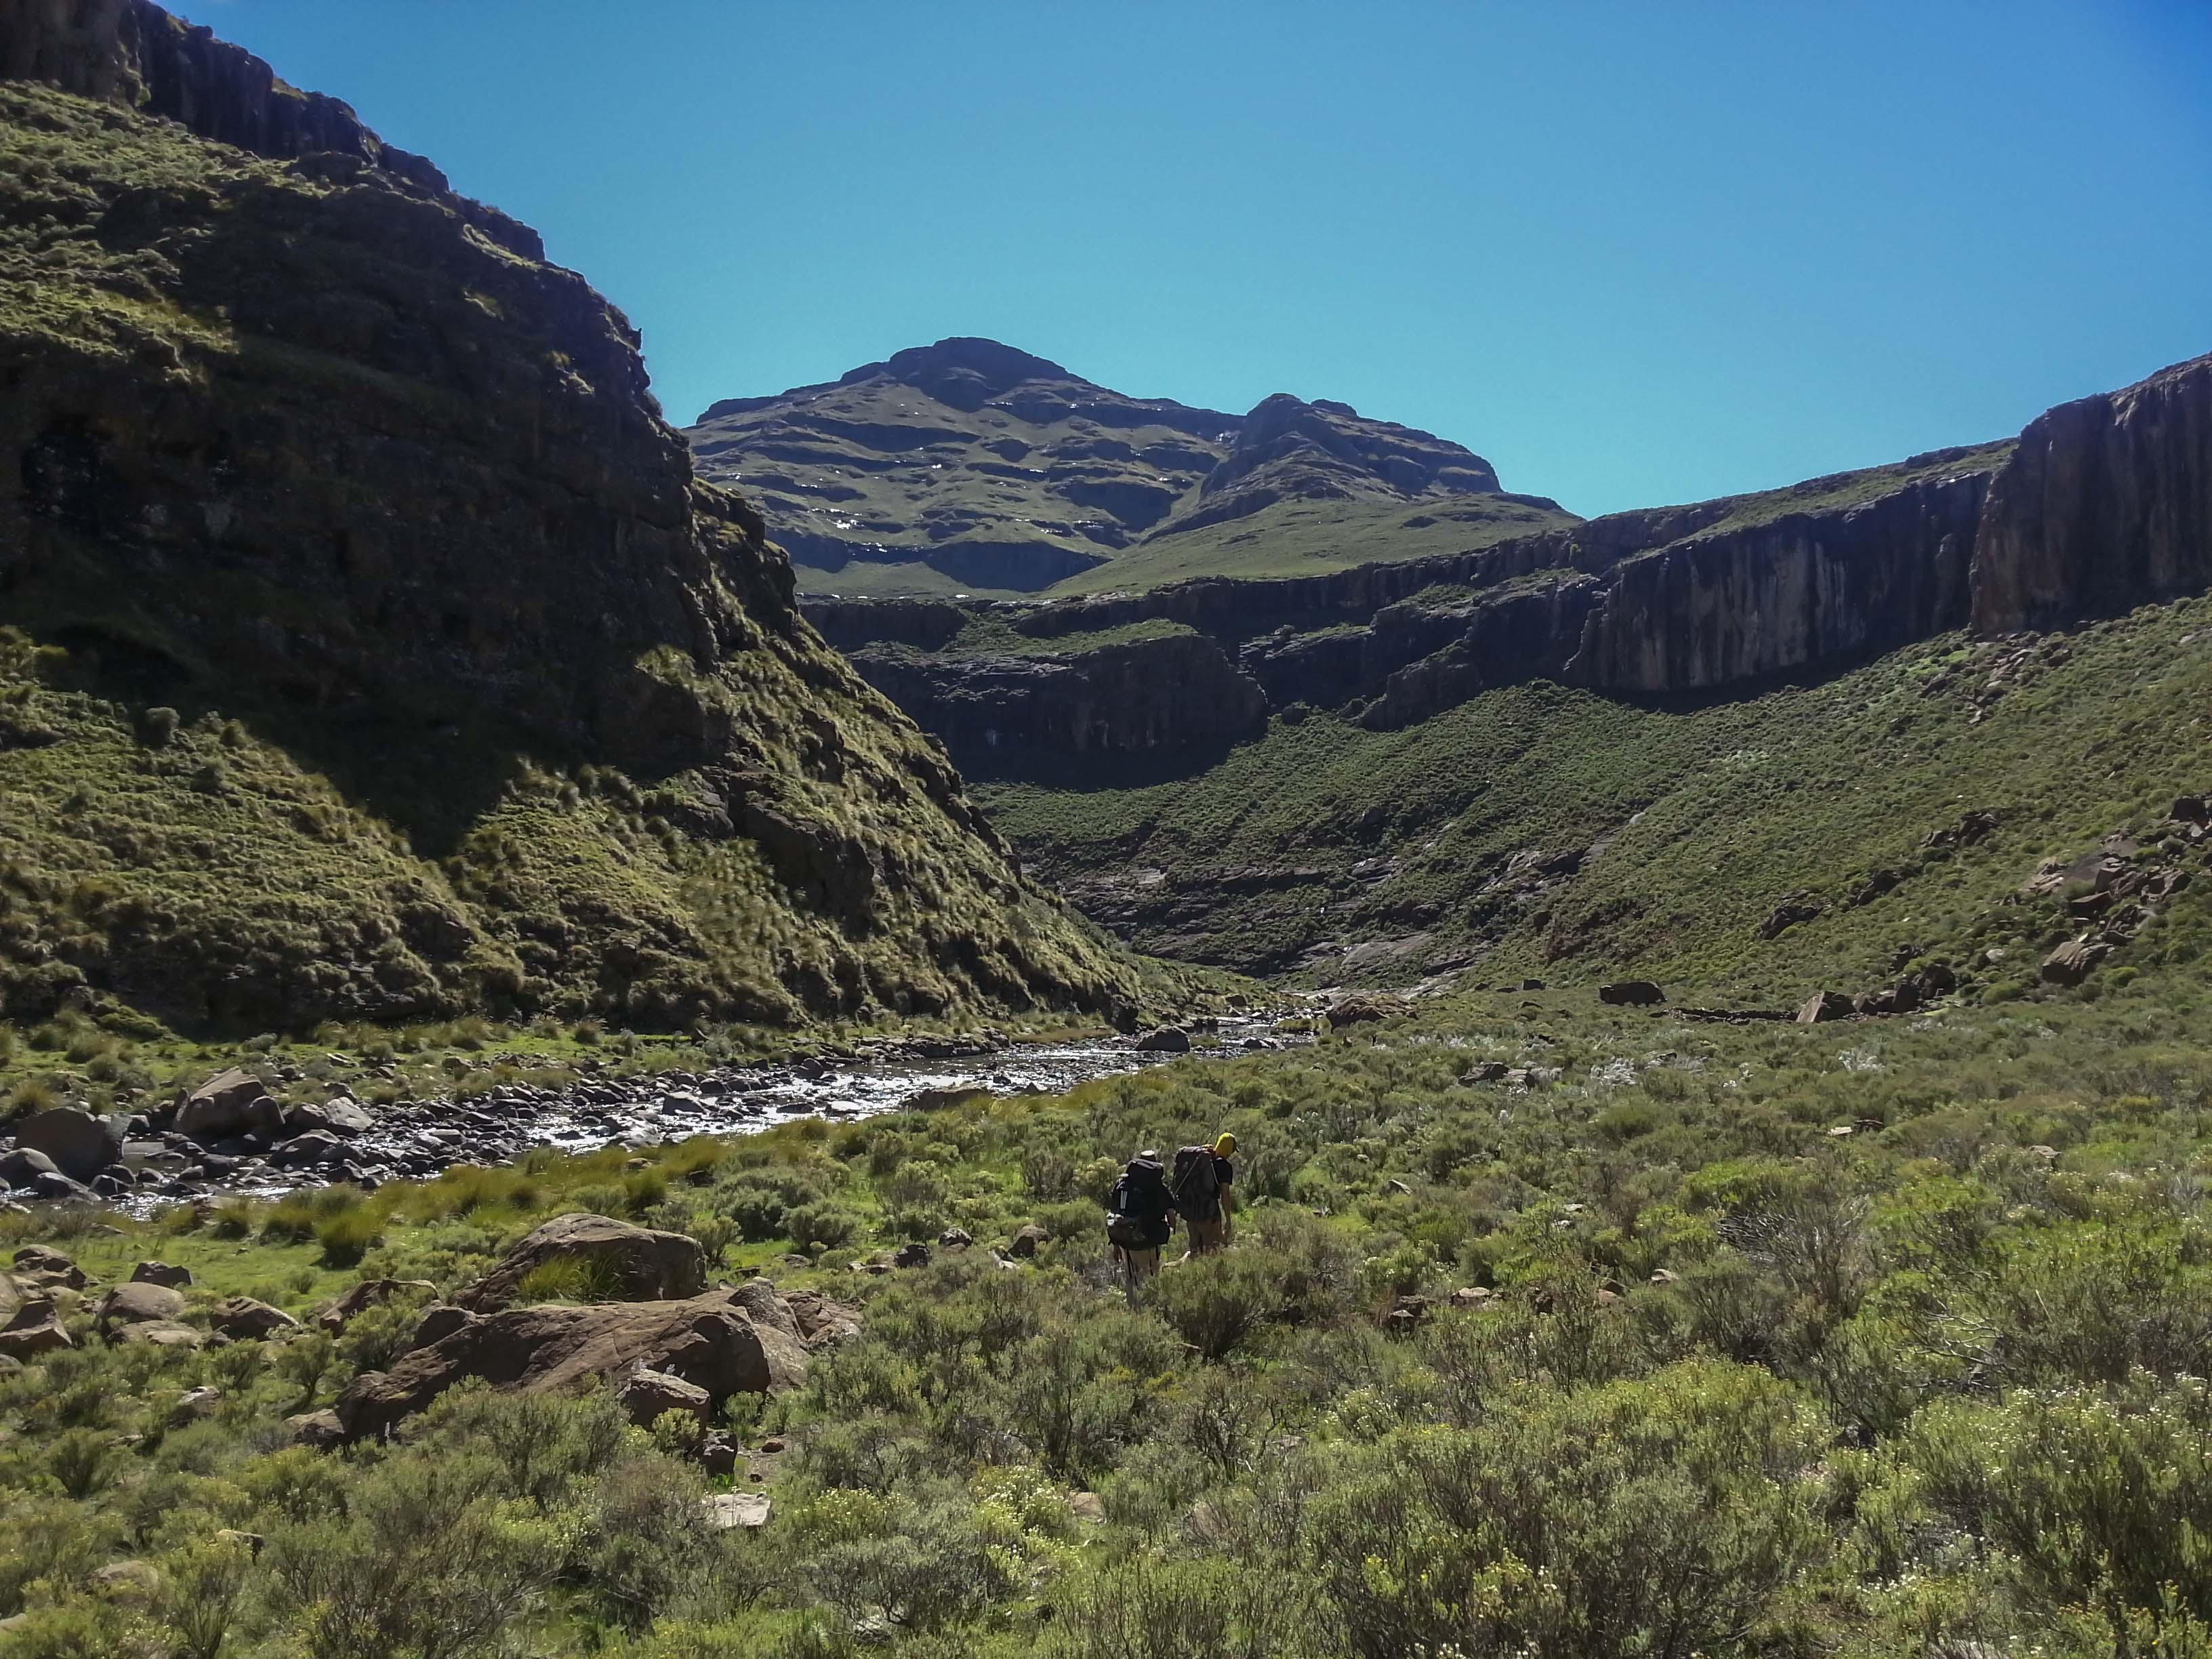 Heading further into the mountains. Photo: Rex Fey